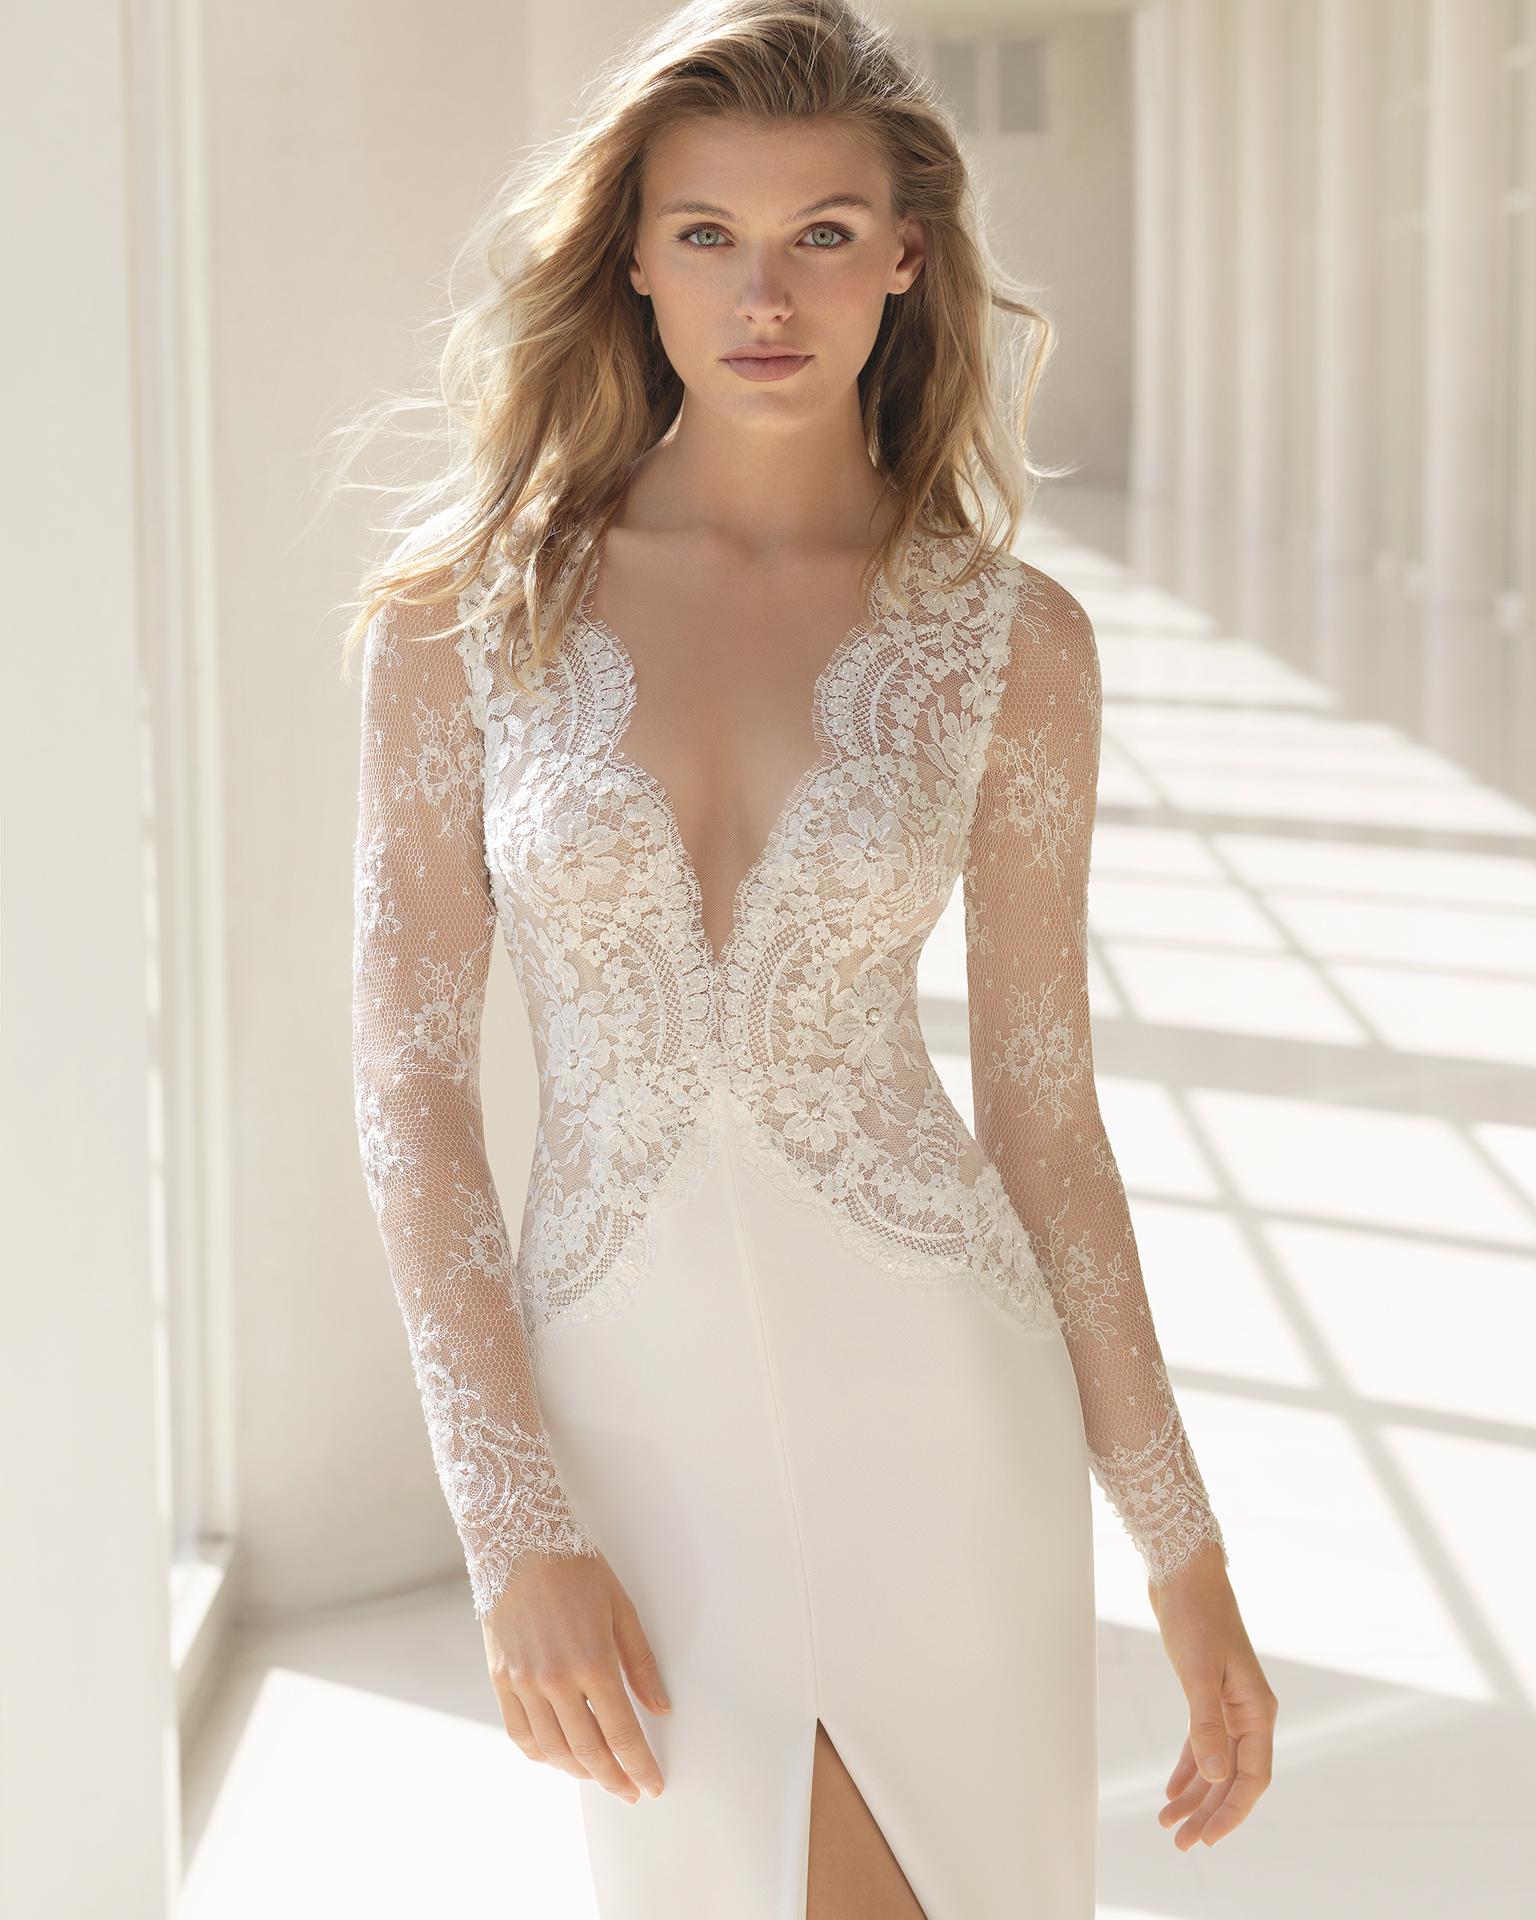 PENELOPE - Hochzeit 2018. Kollektion Rosa Clará Couture